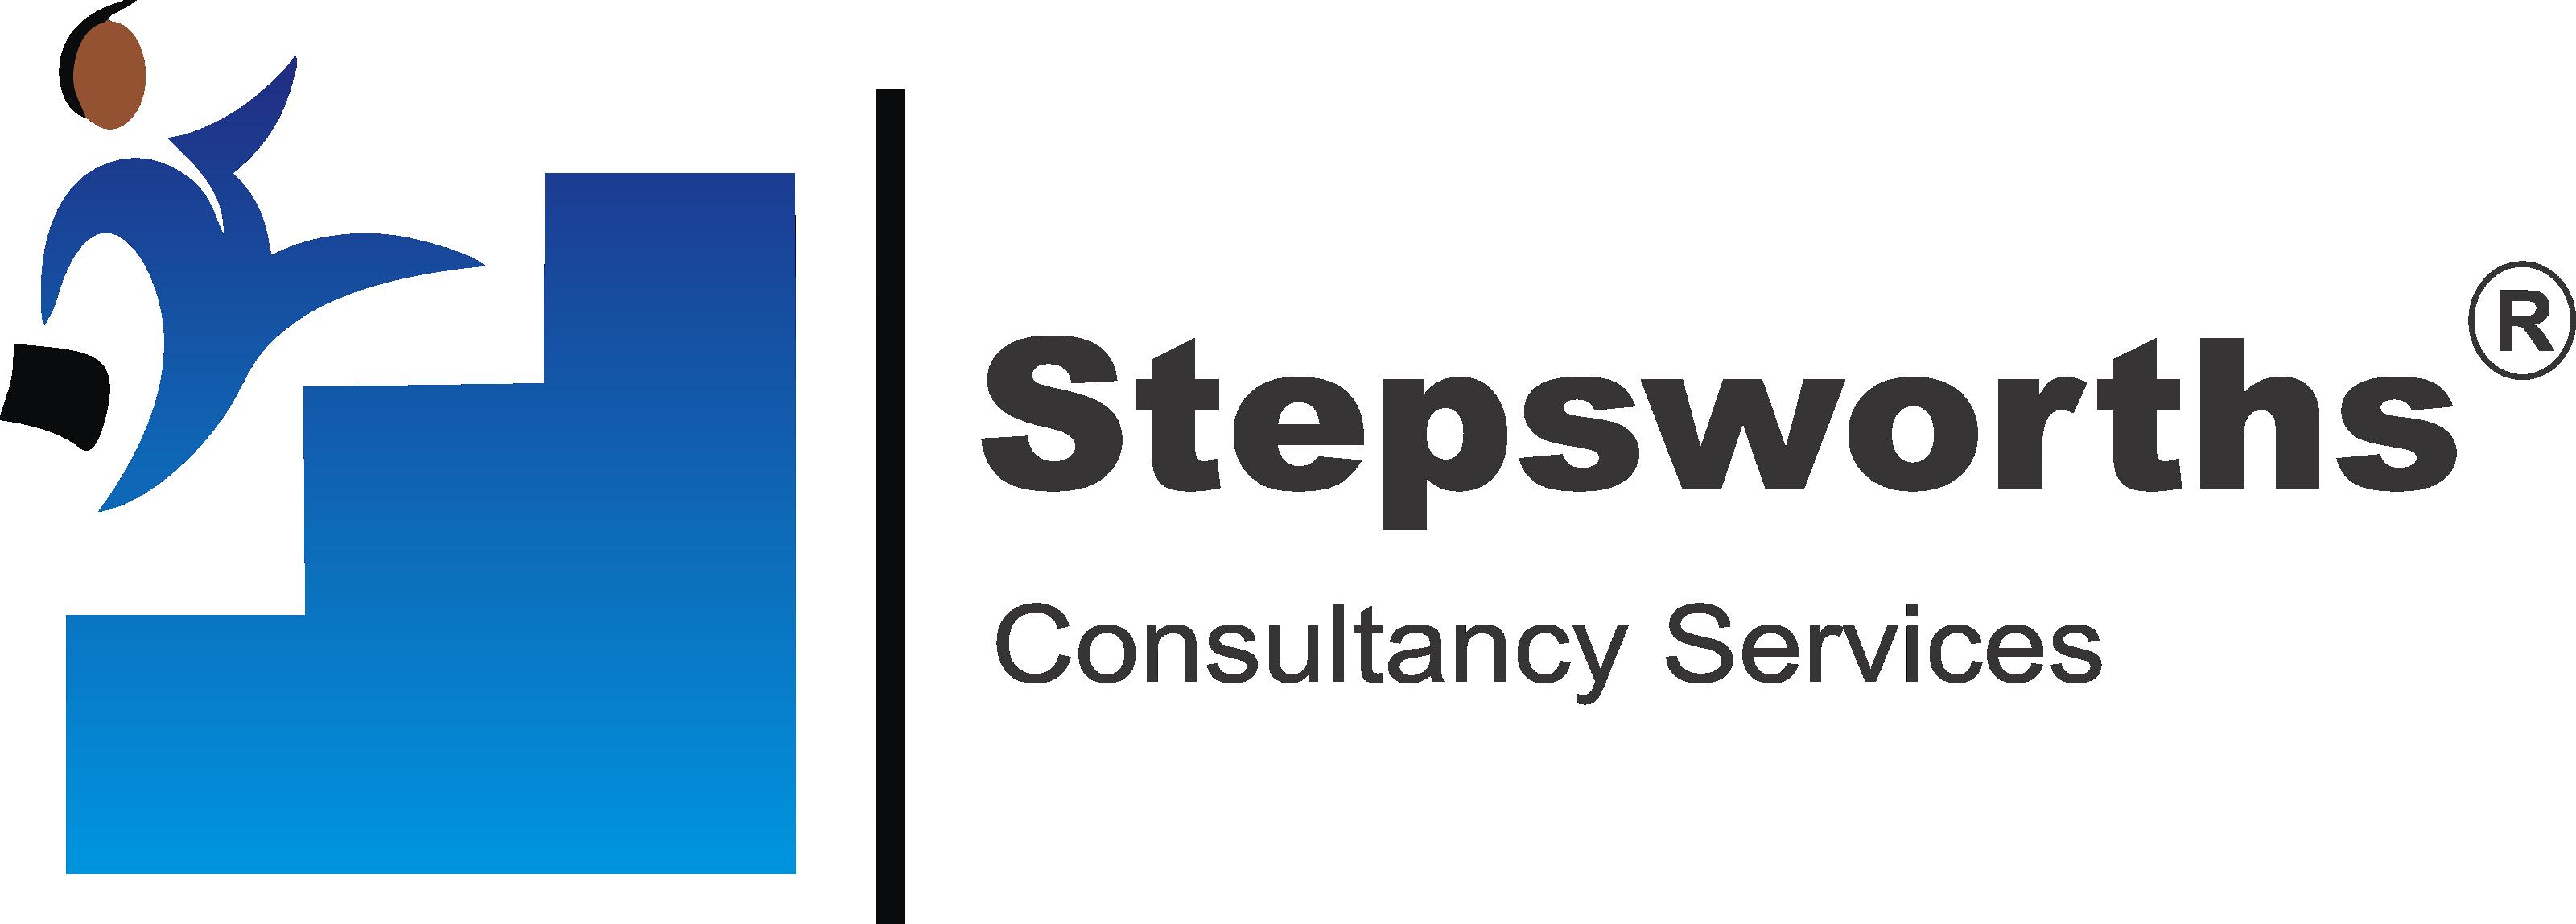 Stepsworths Consultancy Services